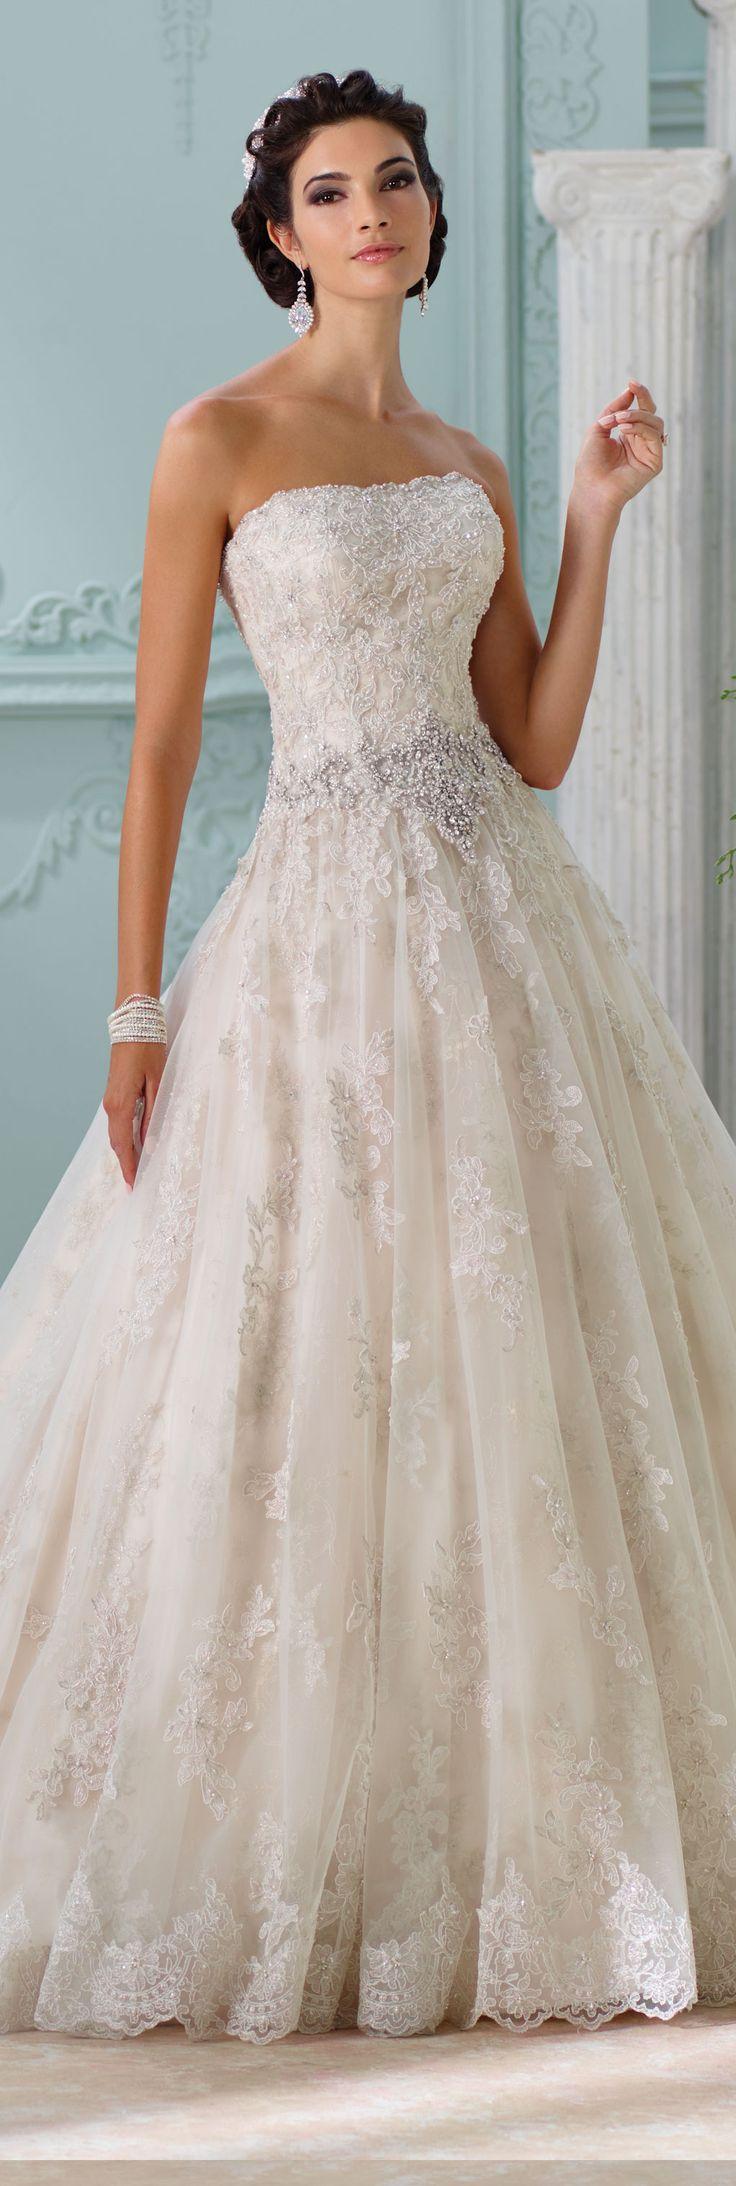 212 best david tutera wedding dresses images on pinterest wedding the david tutera for mon cheri spring 2016 wedding gown collection style no 116230 junglespirit Images